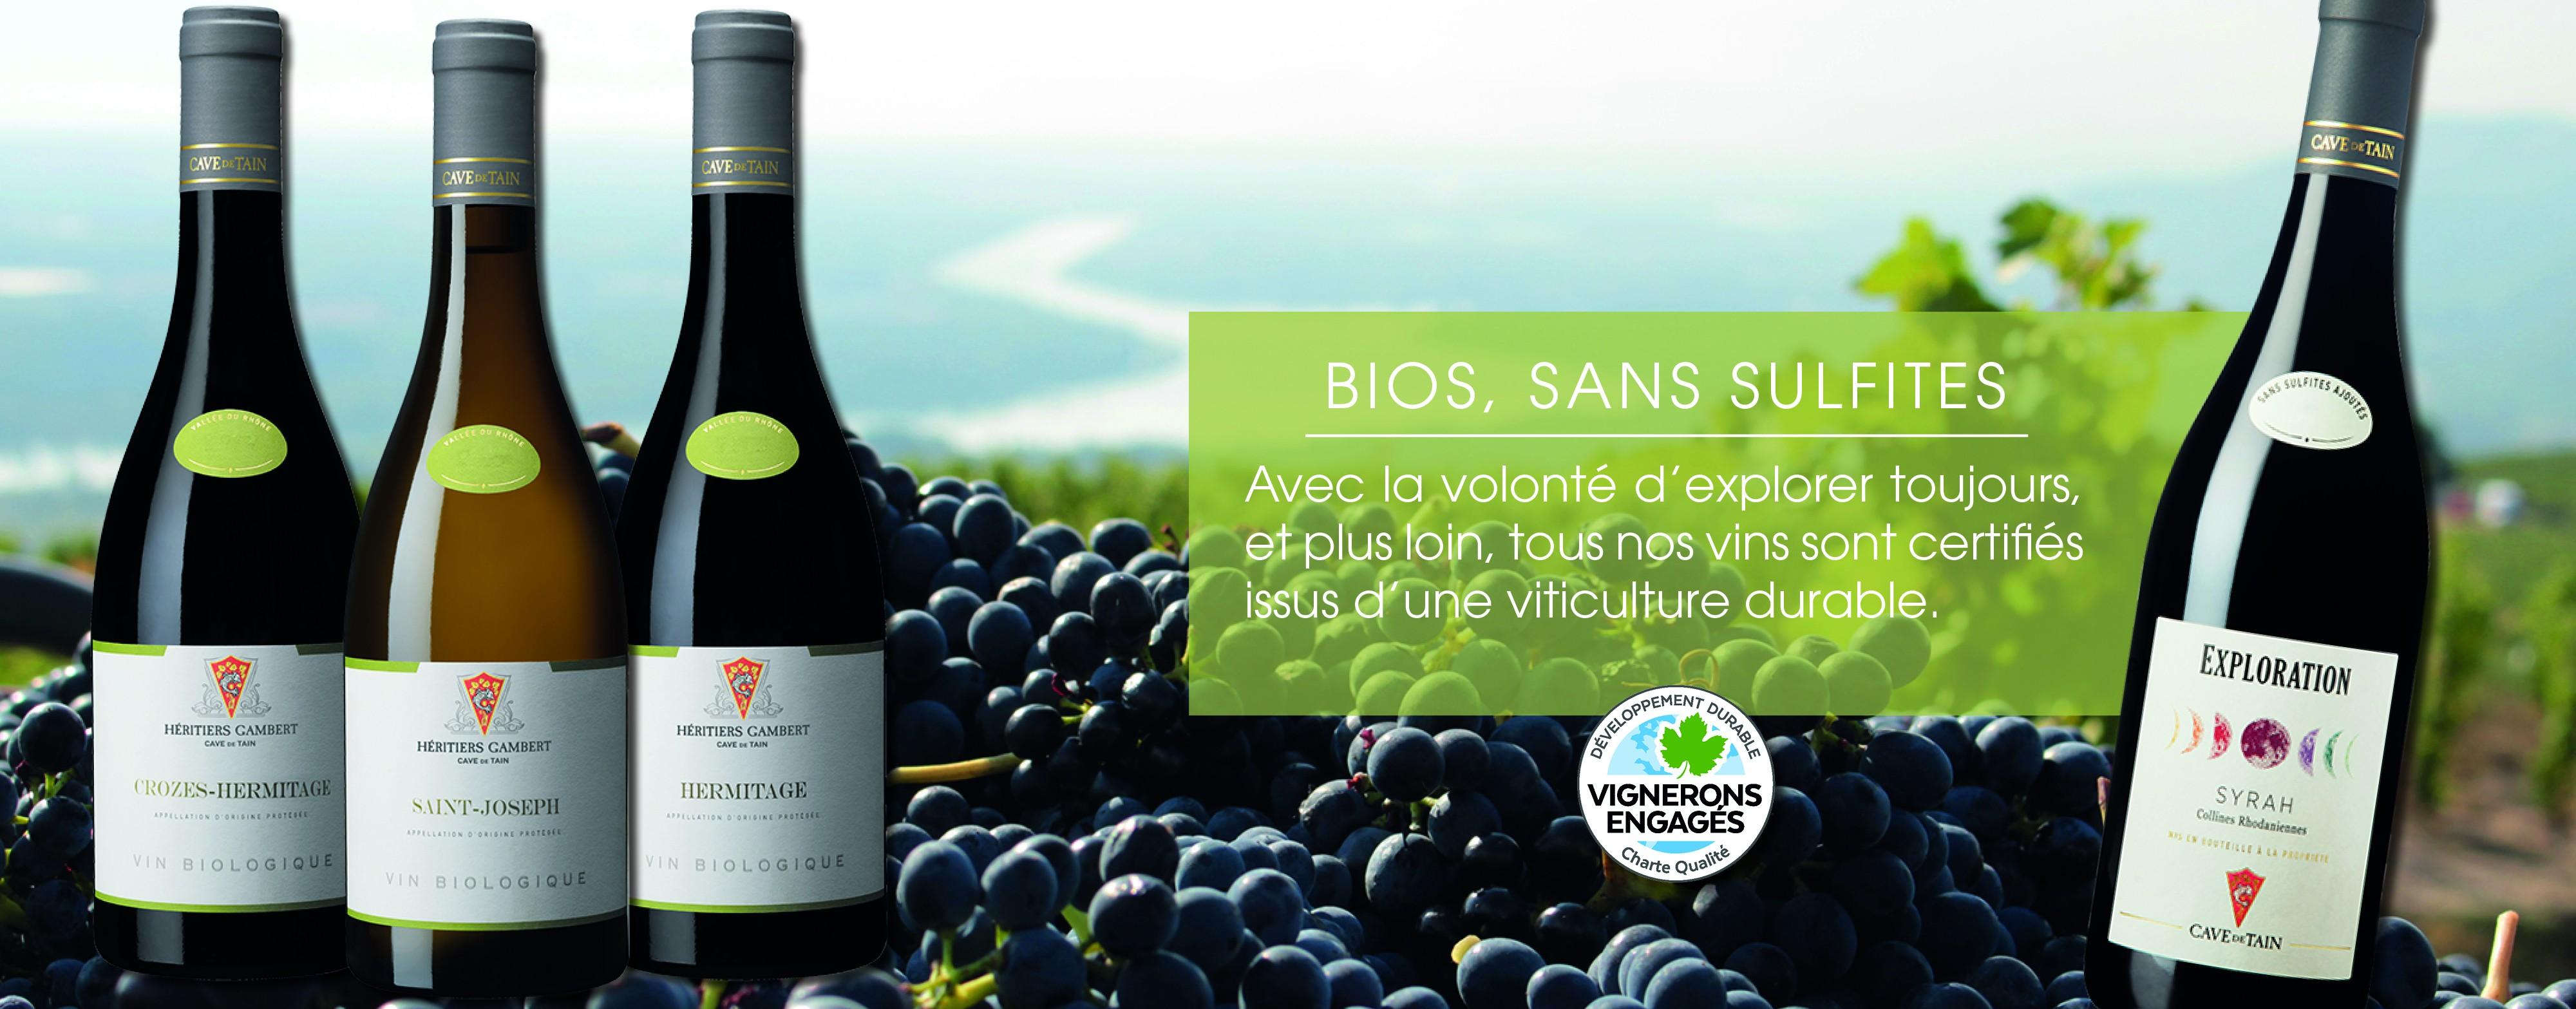 Bios, sans sulfites